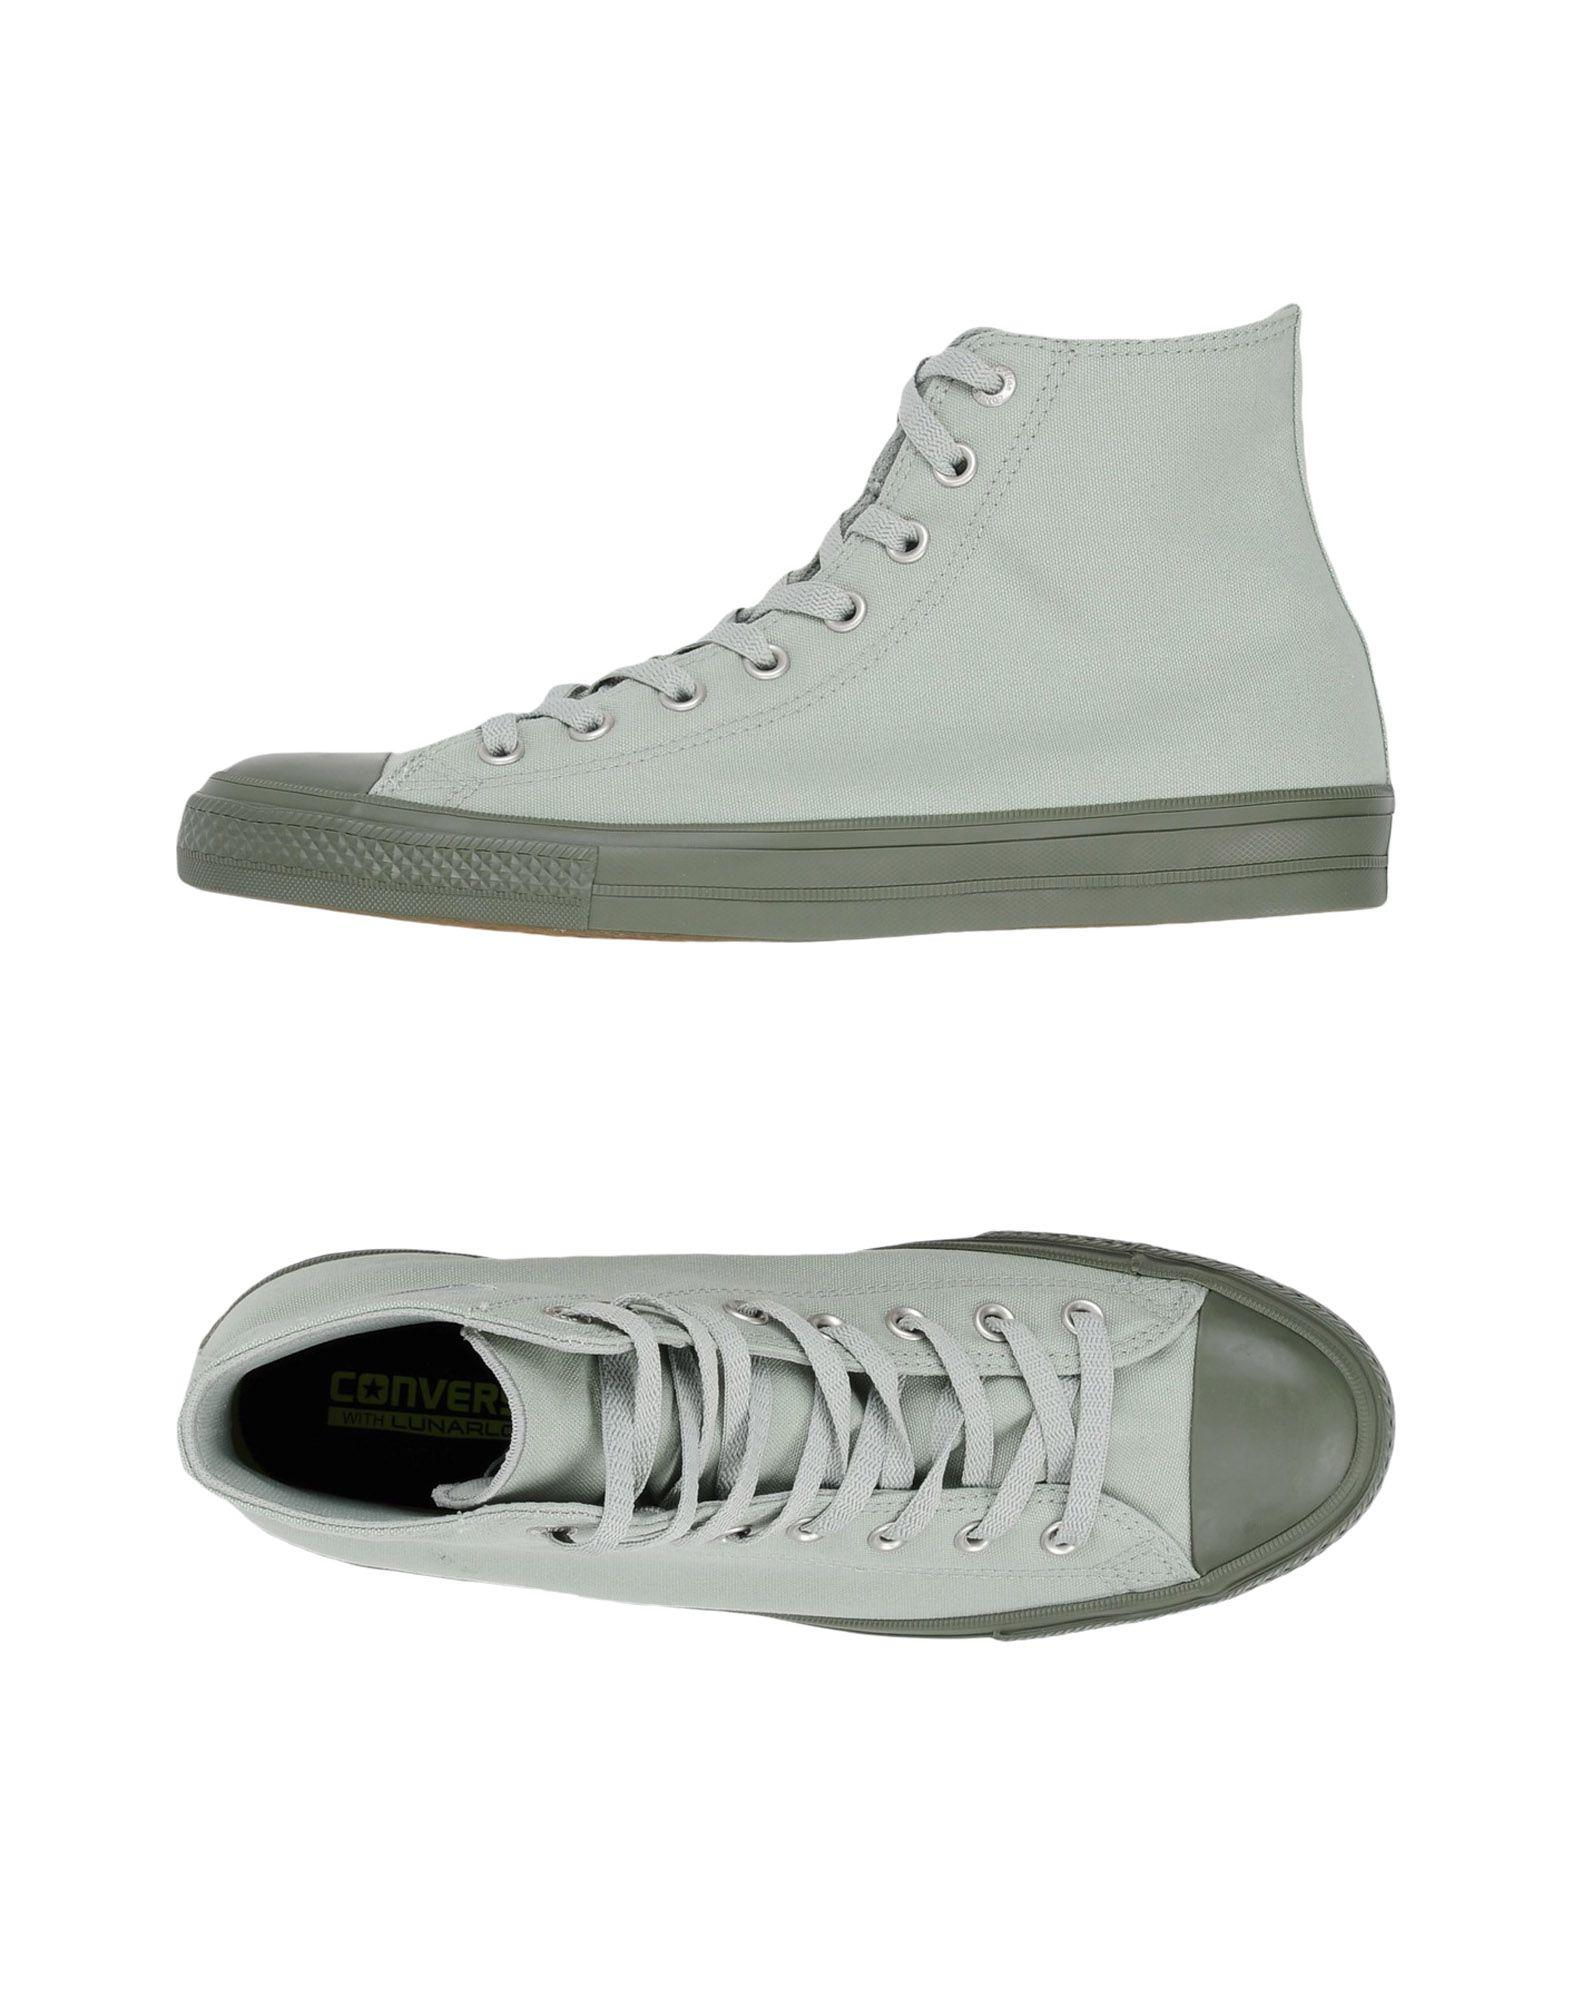 Sneakers Converse All Star Ct As Ii Hi Canvas - Uomo - 11273138SK